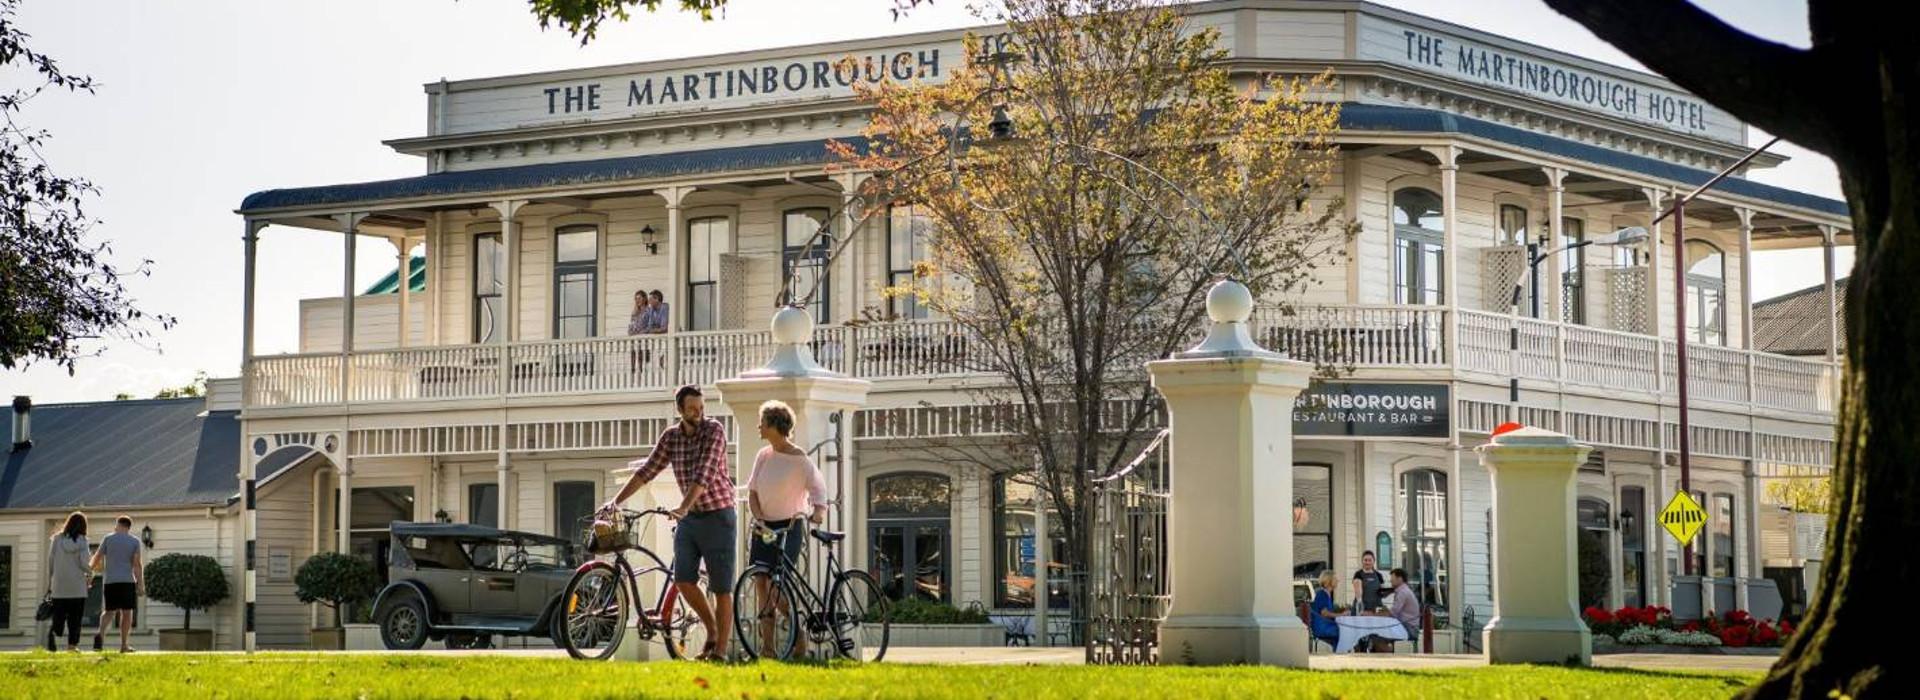 Martinborough hotel @Stuff